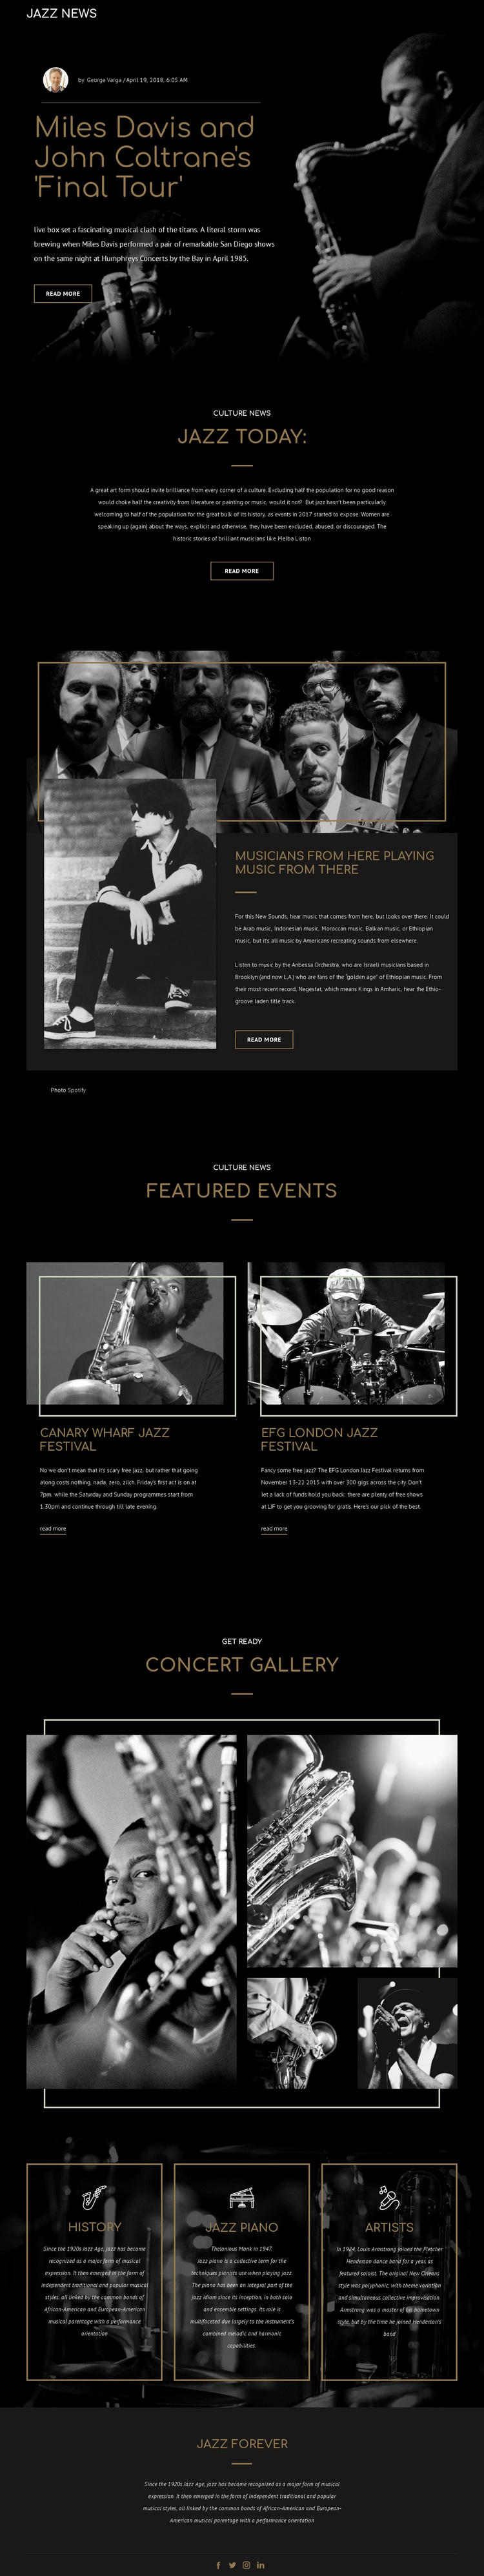 Legengs of jazz music Website Template